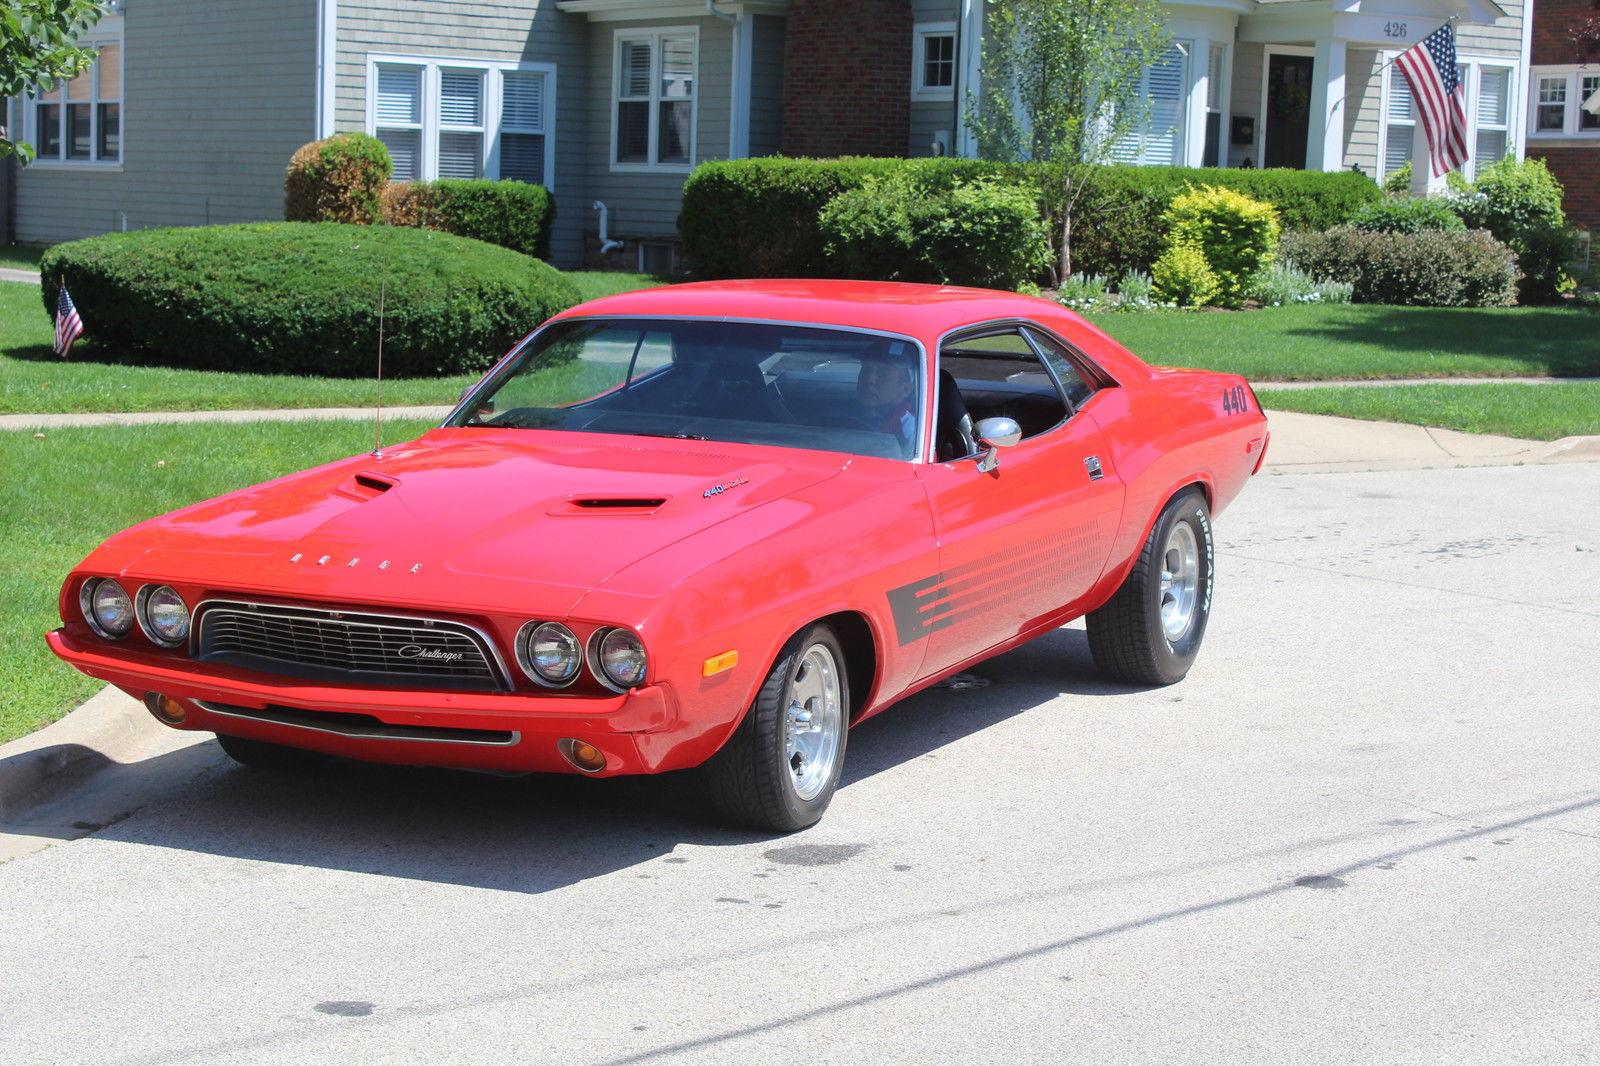 1973 Dodge Challenger-14546456